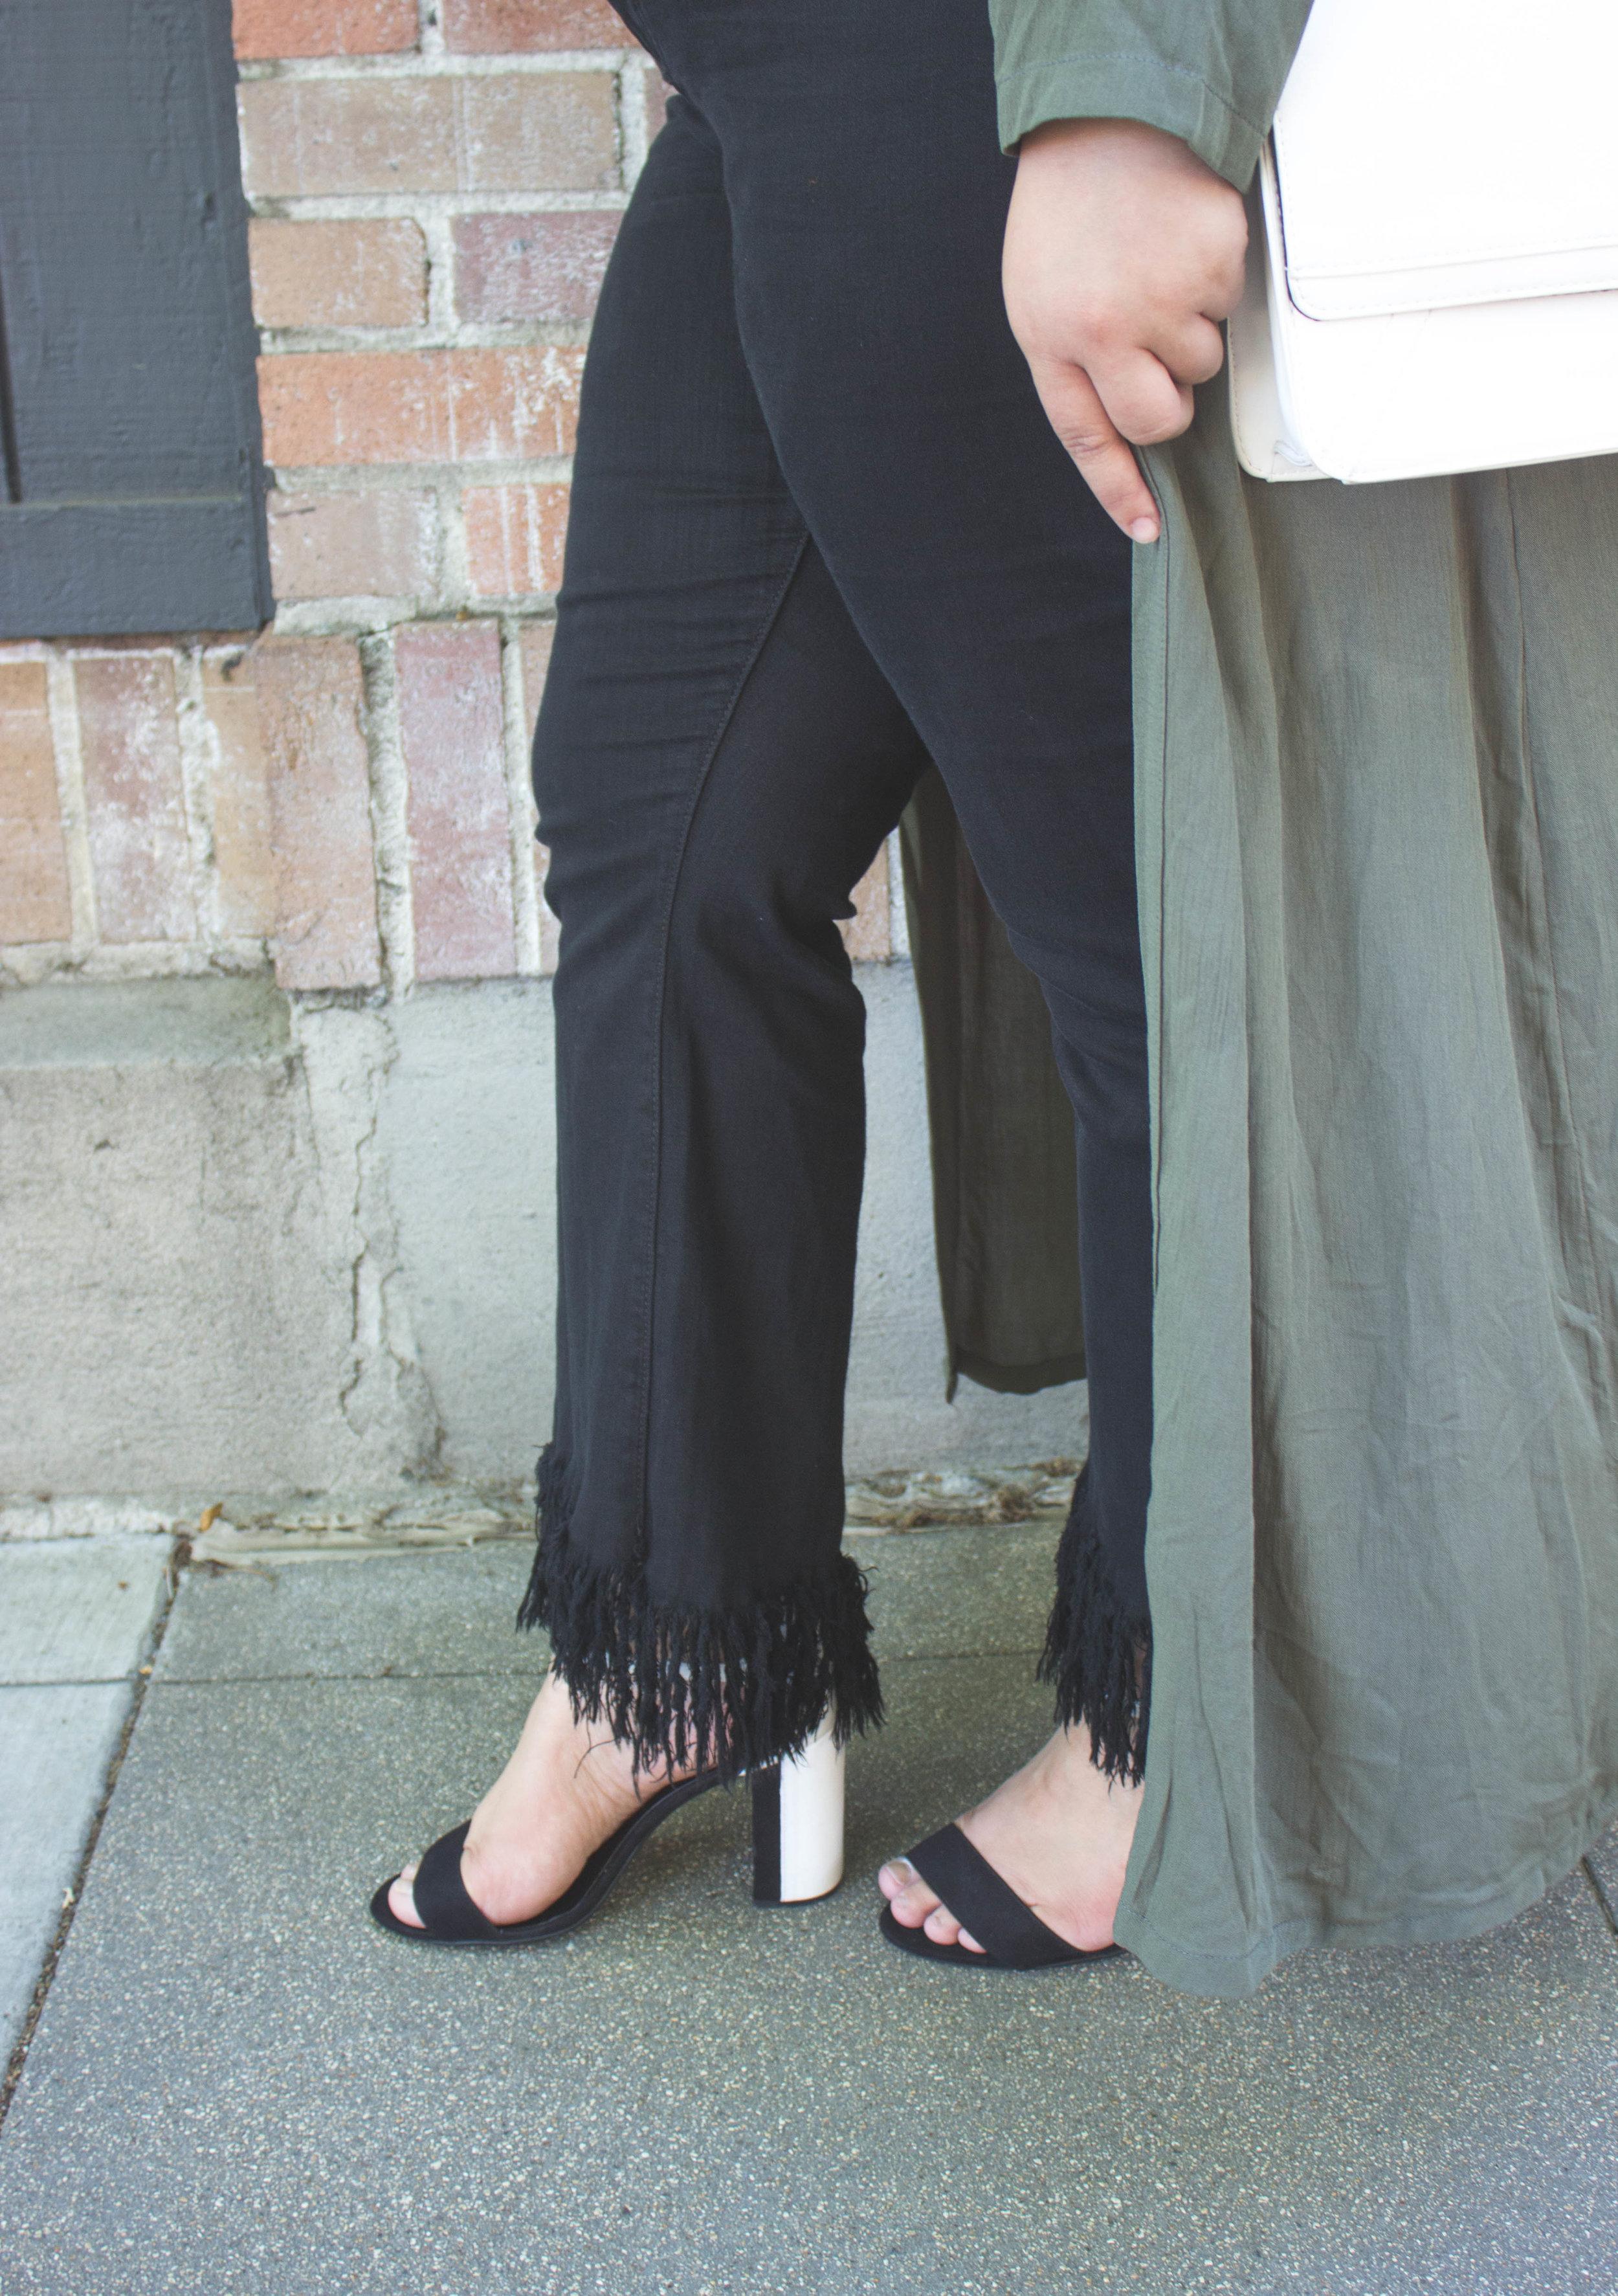 + Frayed black denim+ Black and white sandal heels *Solid black or solid white heels work perfectly, too* -